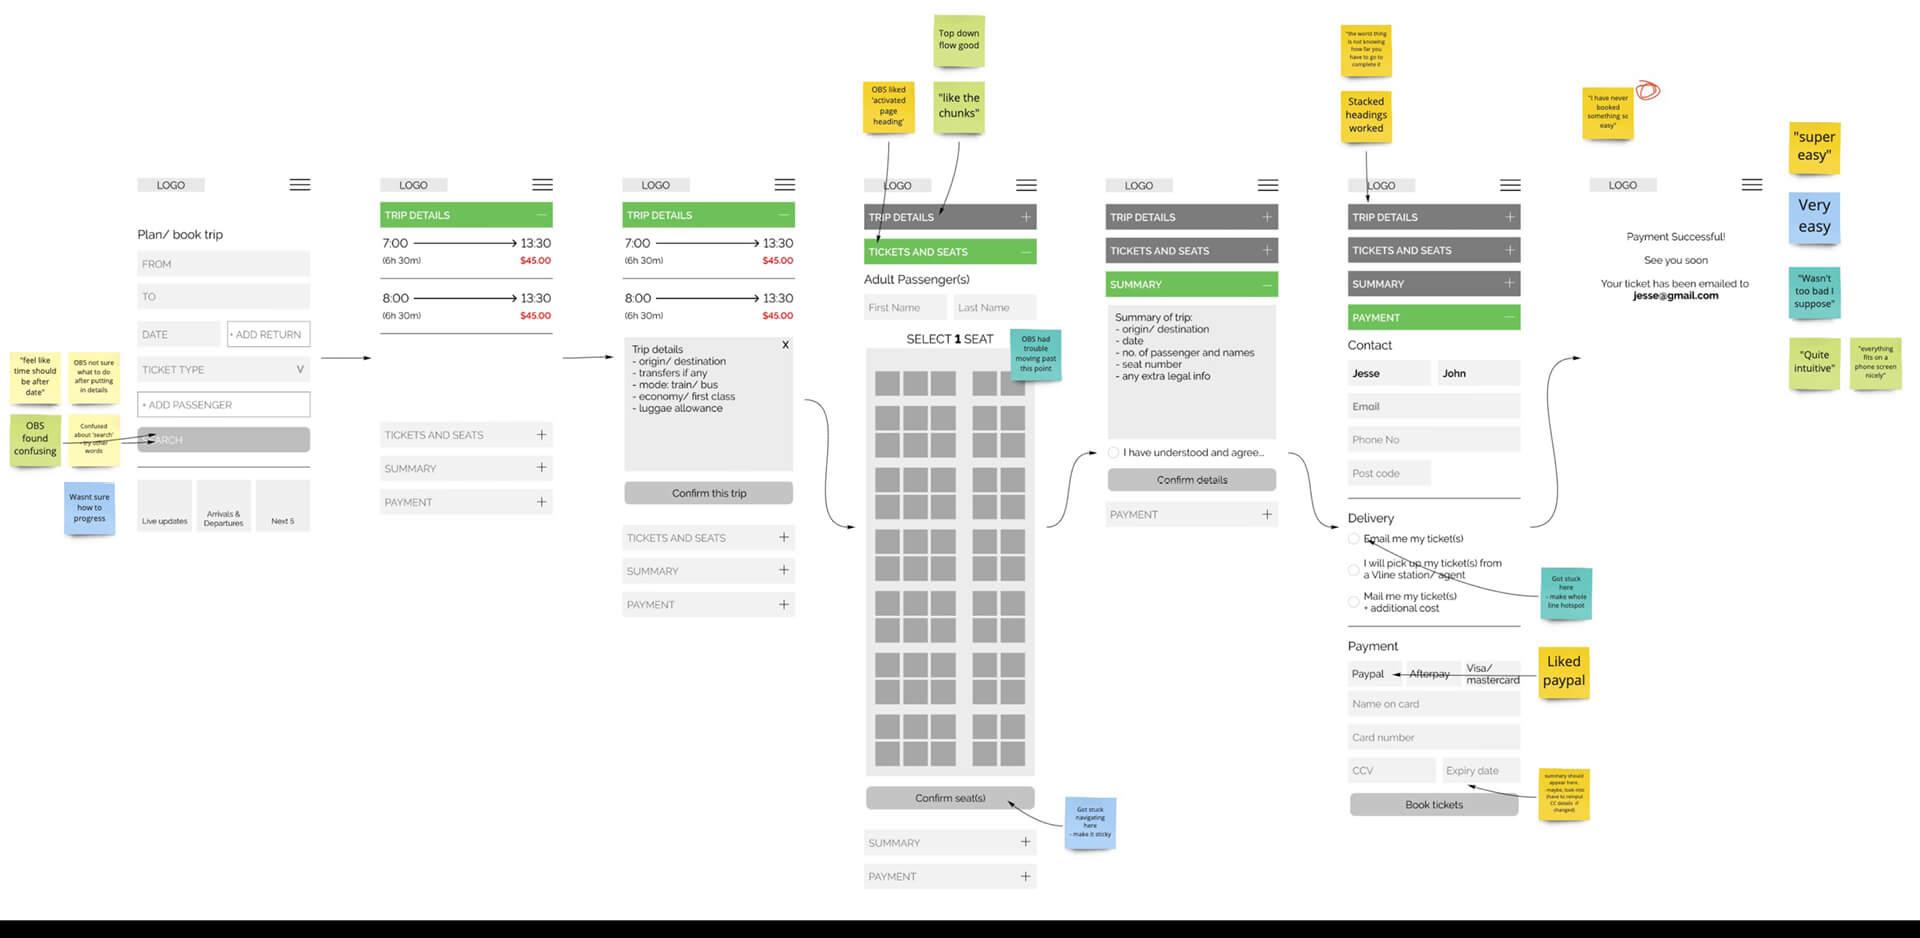 UX_design_Vline_Usability_Testing_01_2